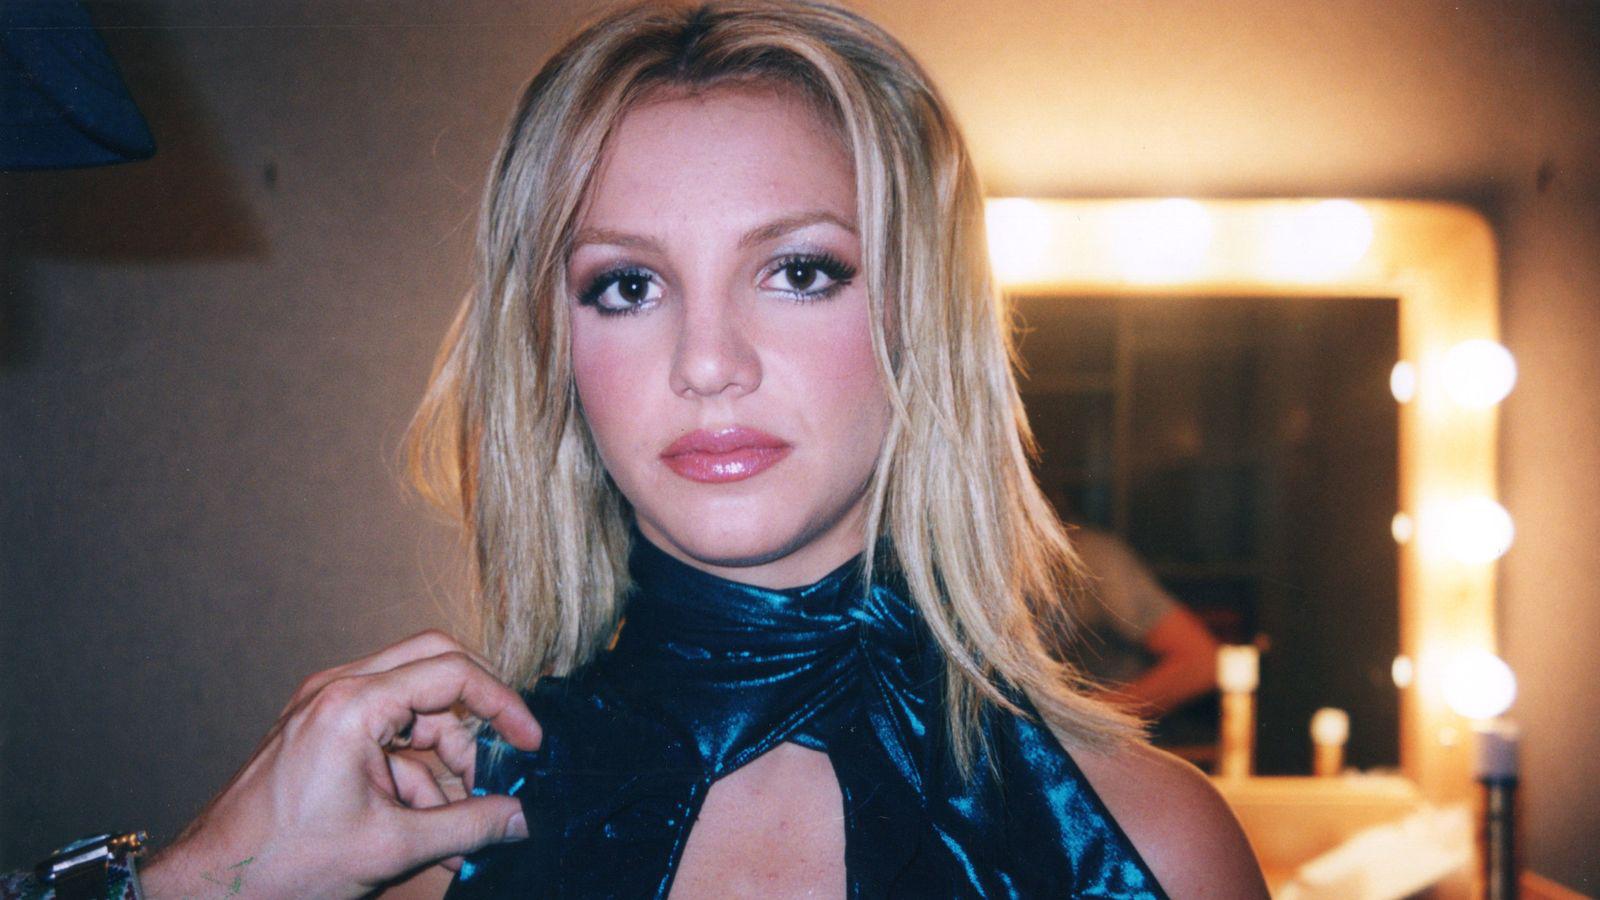 Britney Spears: Οι αντιδράσεις και η συμπαράσταση των celebrities μετά την προβολή του ντοκιμαντέρ για τη ζωή της [vid]